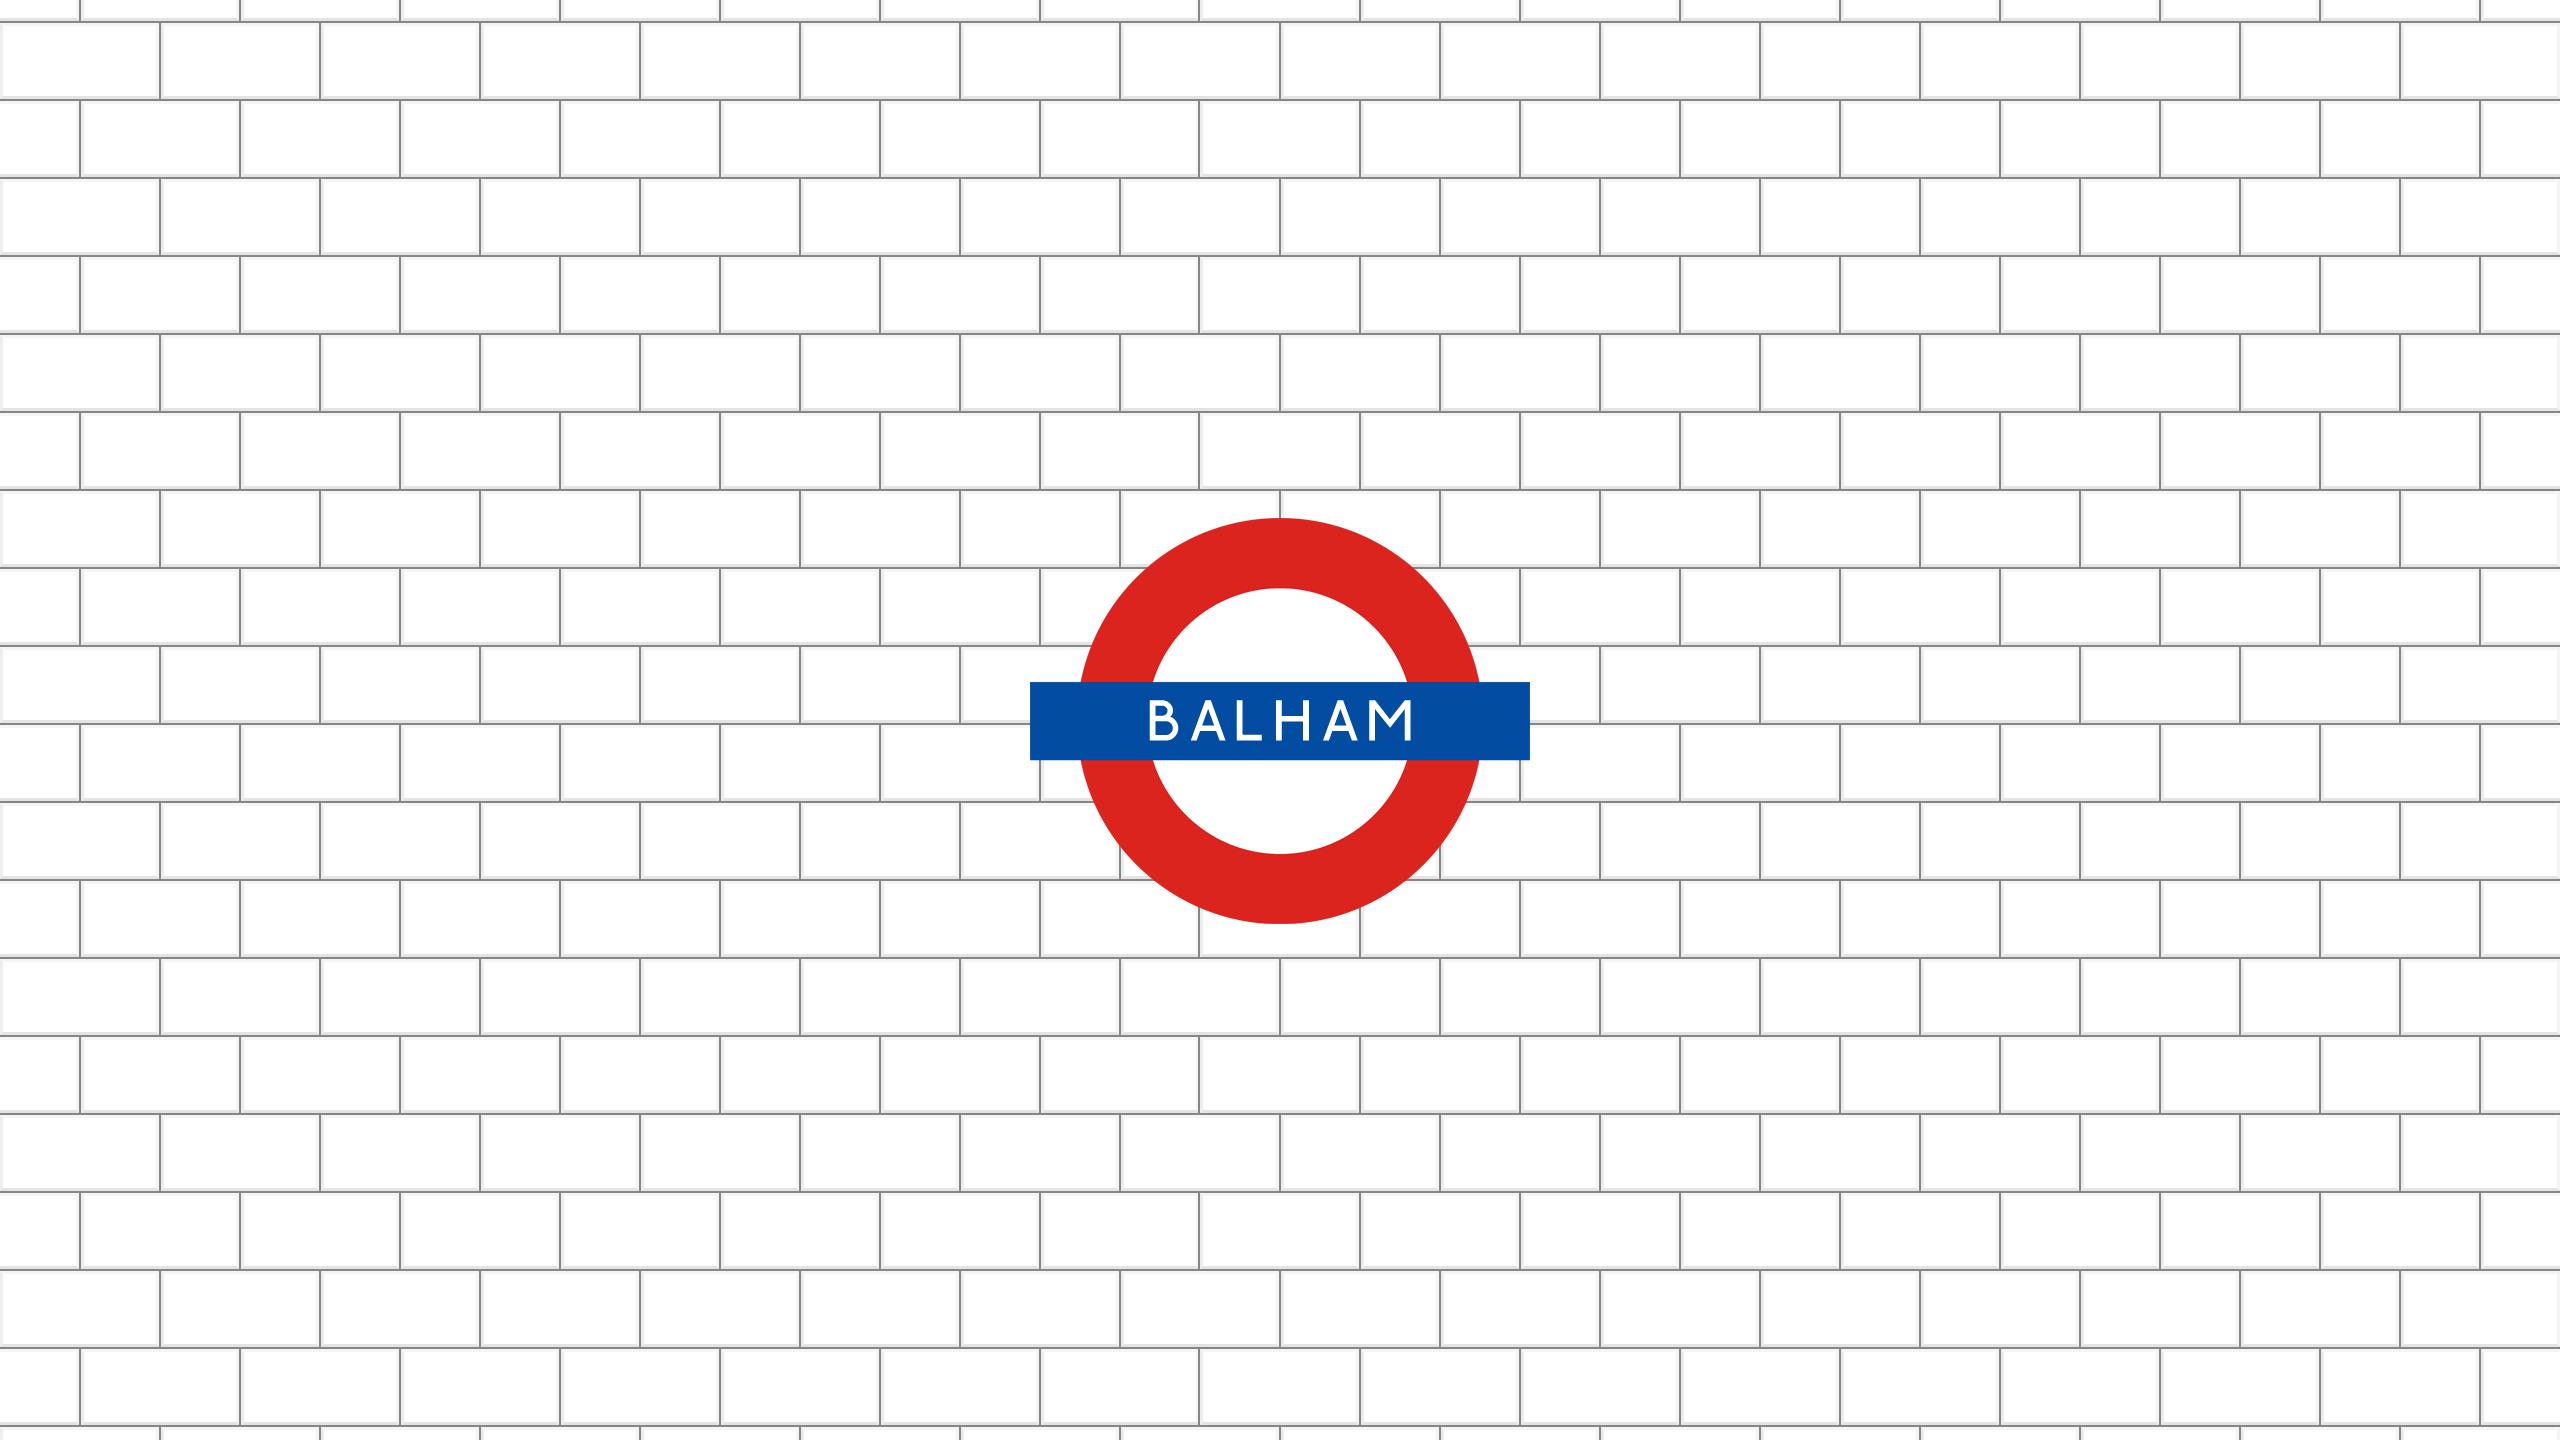 Balham